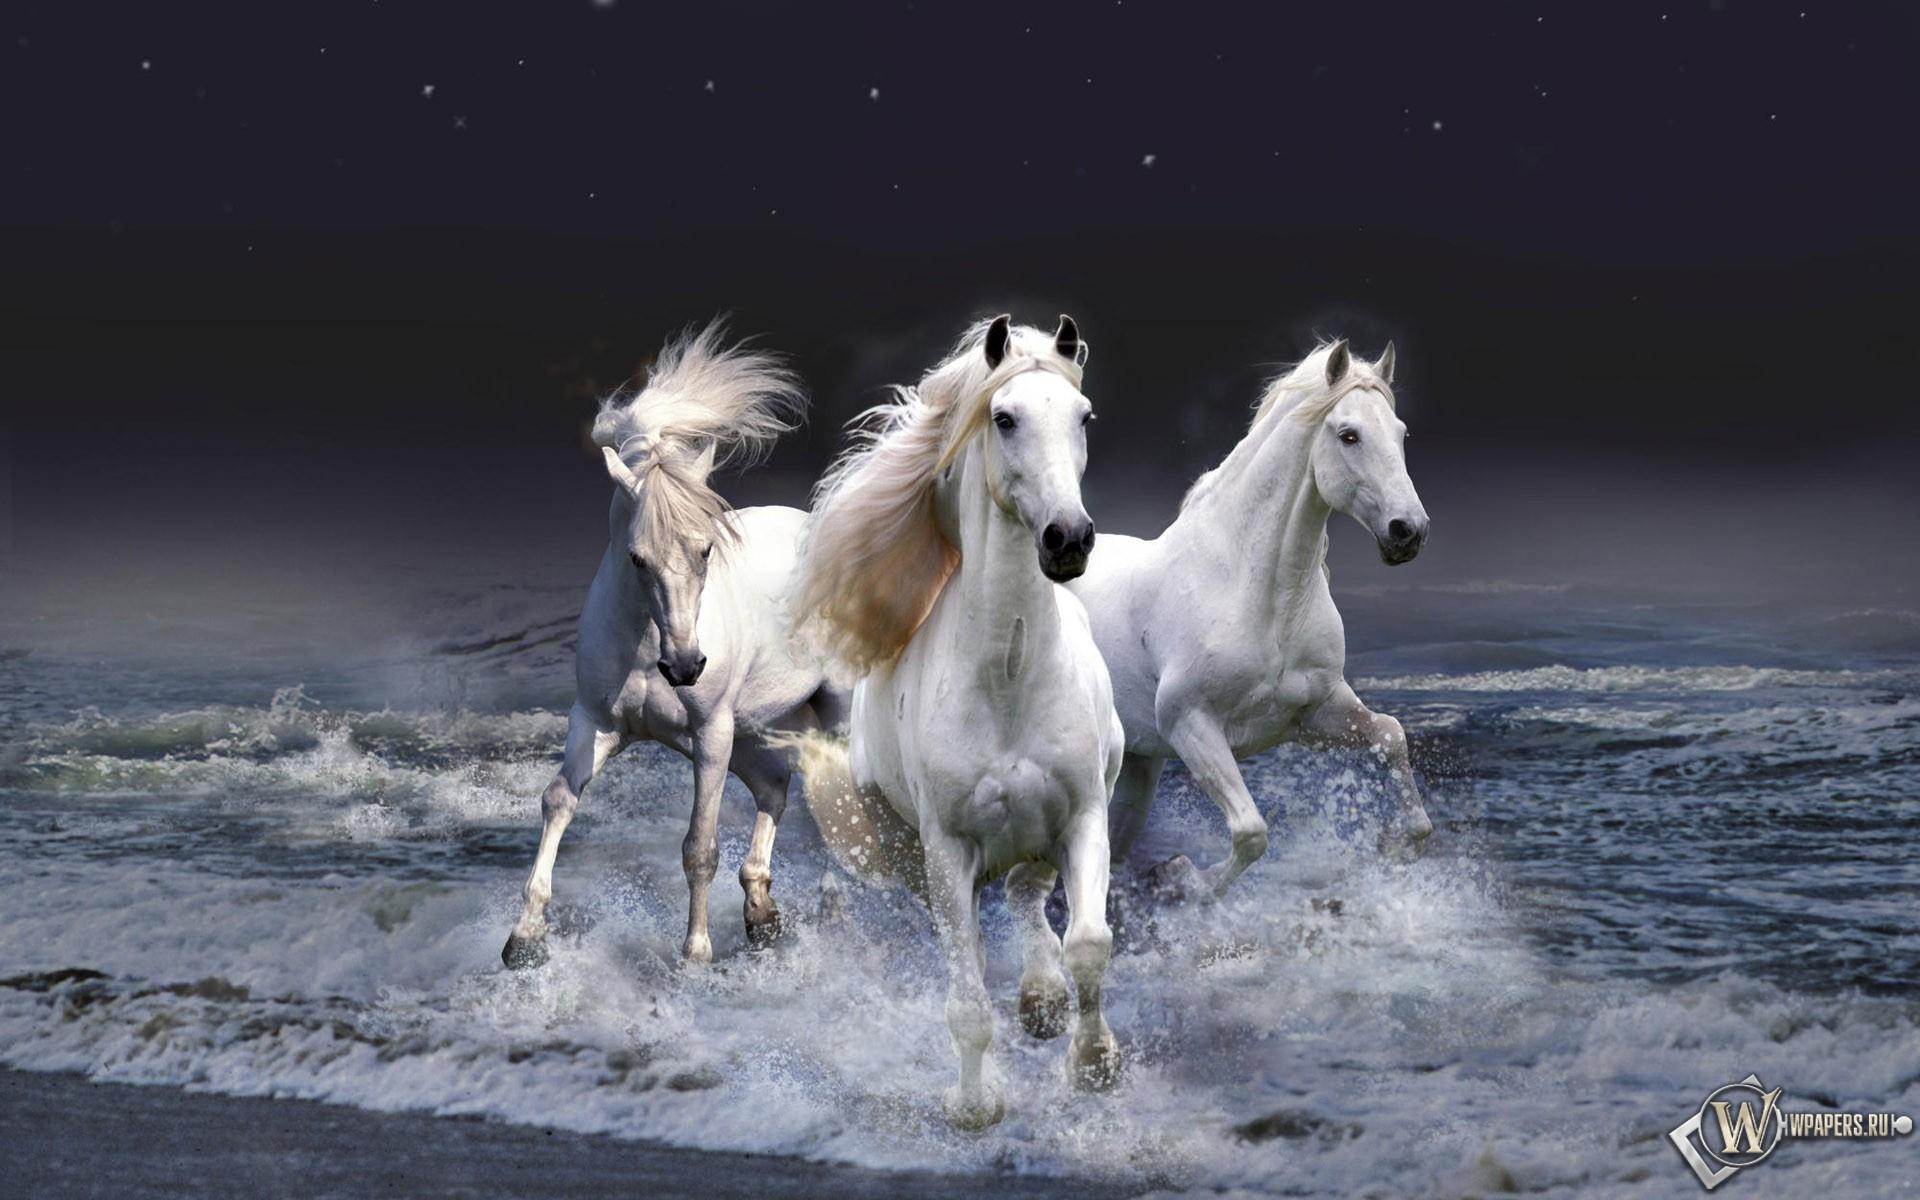 Белые лошади бегущие по волнам 1920x1200